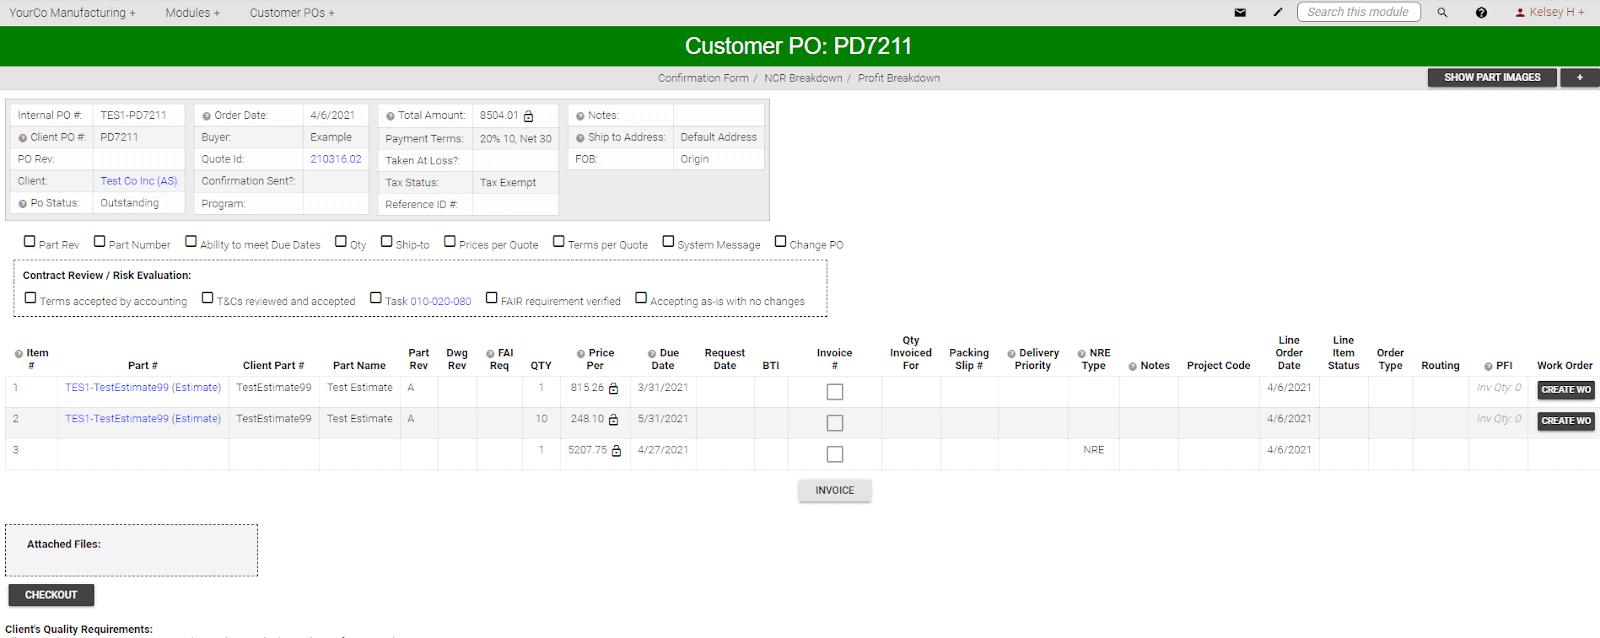 Customer PO REPORT